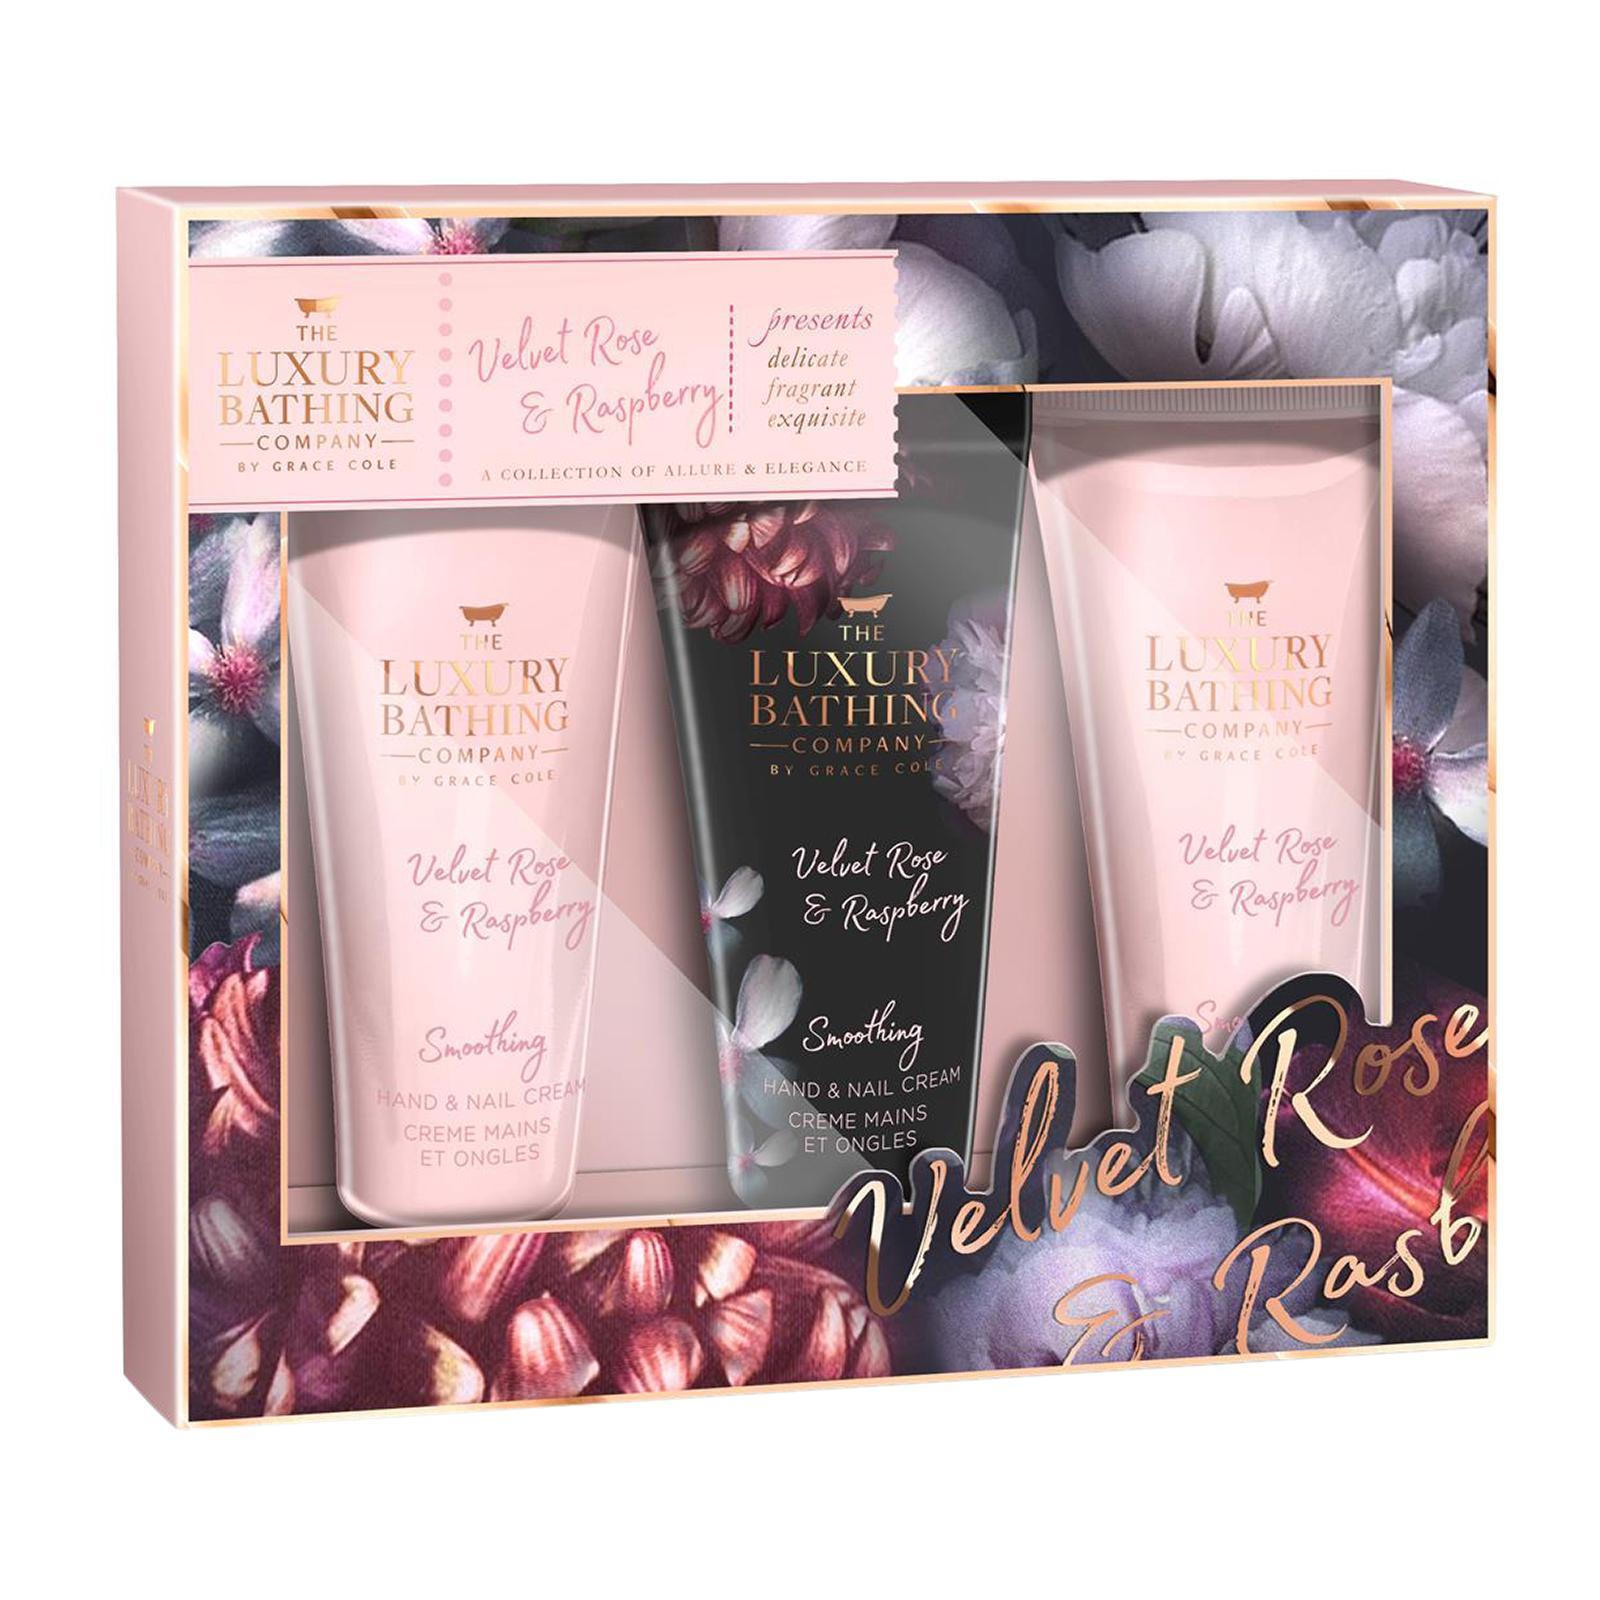 Grace Cole Velvet Rose and Raspberry - Tempting Trio Gift Set